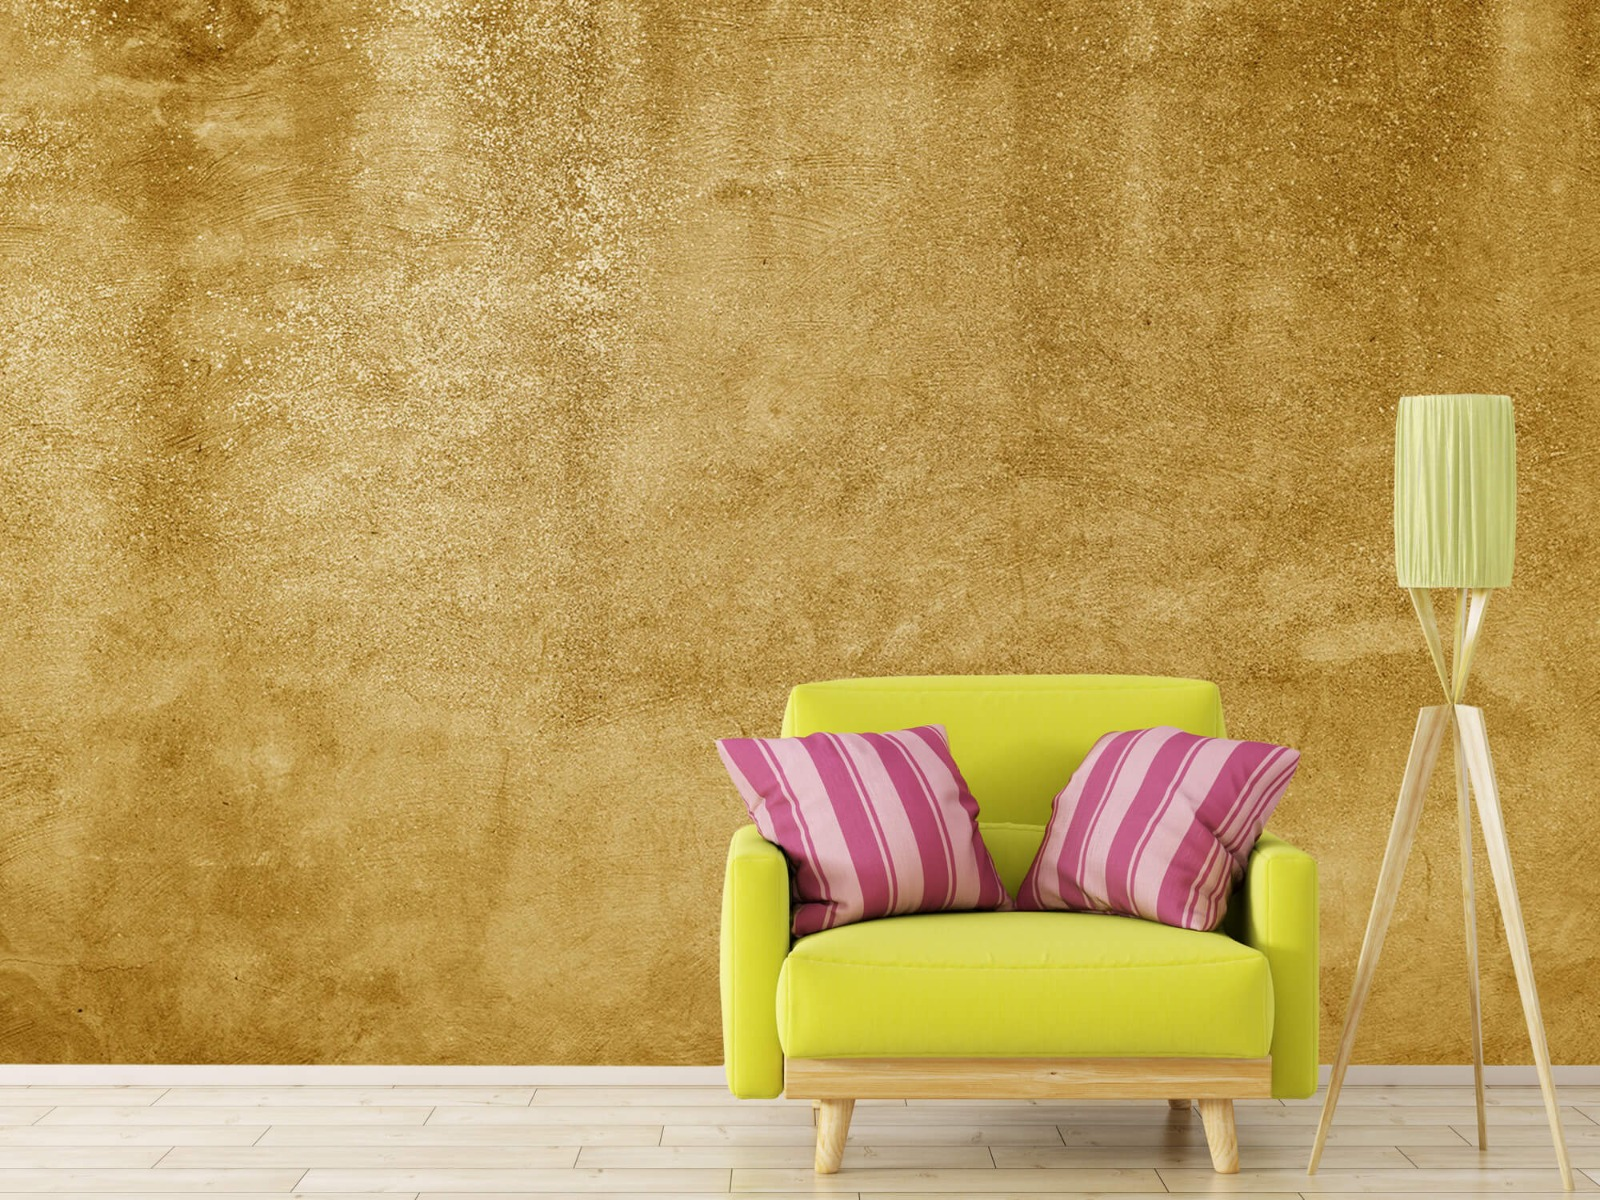 Betonlook behang - Oker geel beton - Woonkamer 17